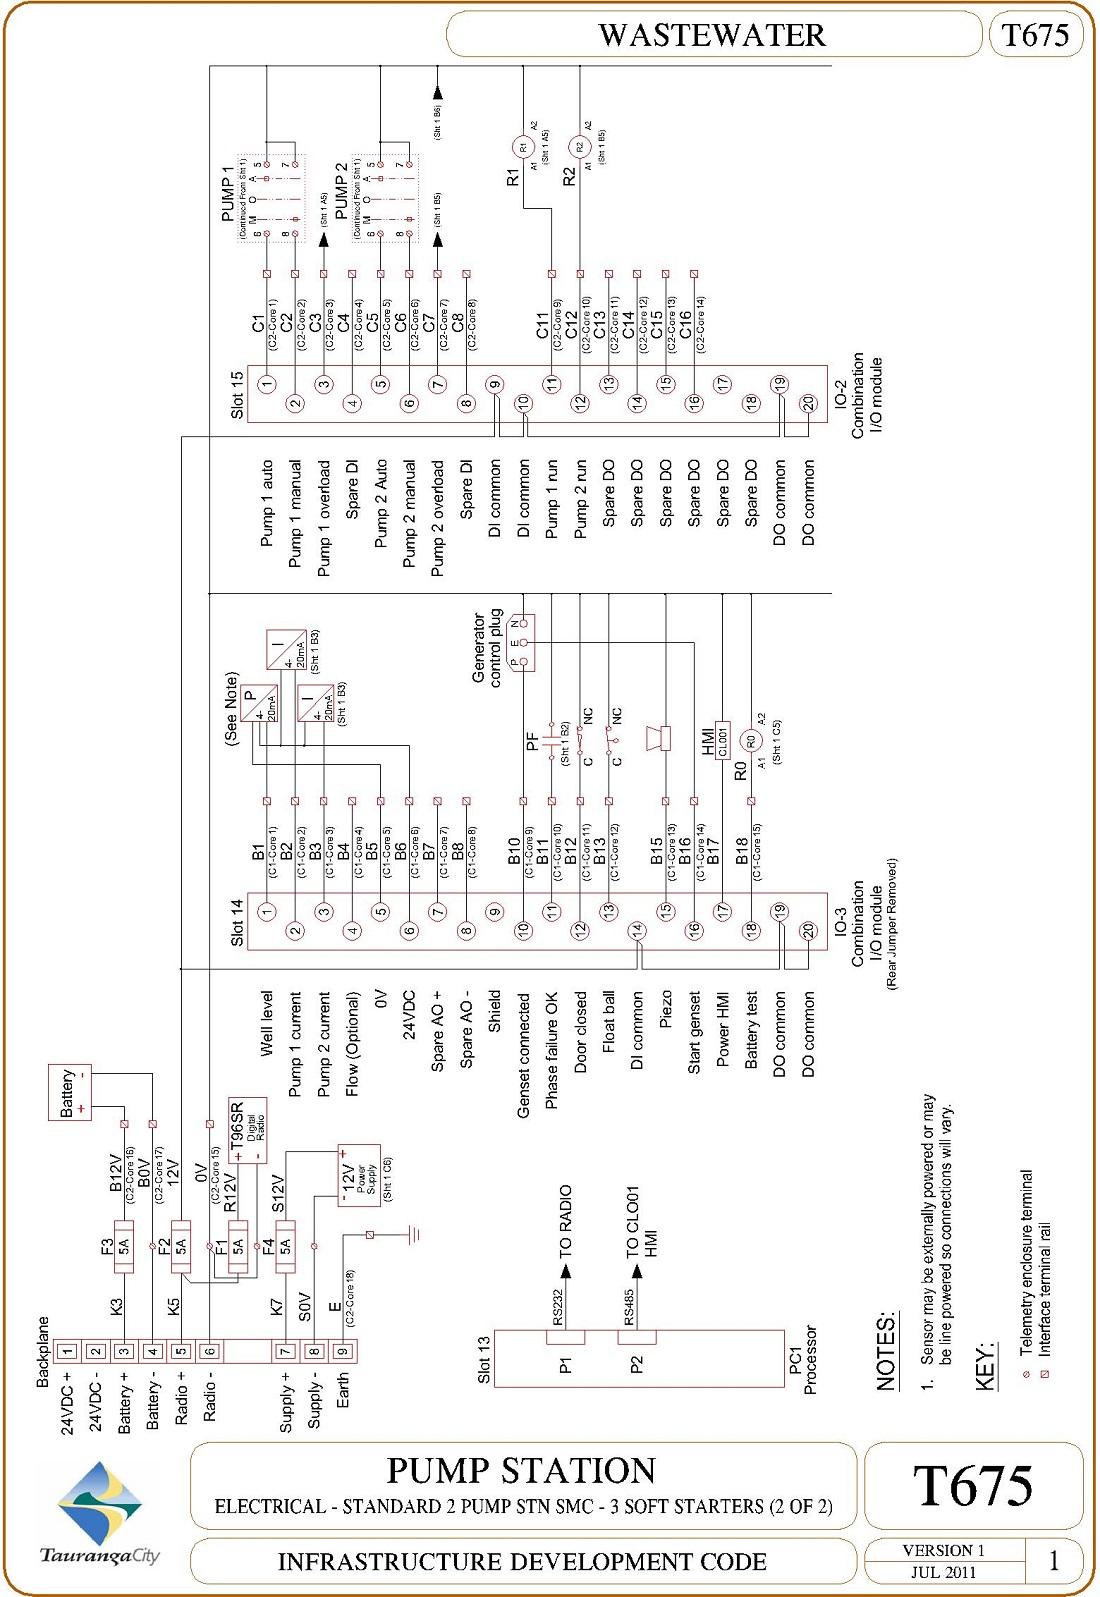 Pump Station - Electrical - Standard 2 Pump Stn SMC - 3 Soft Starters (2 of 2)